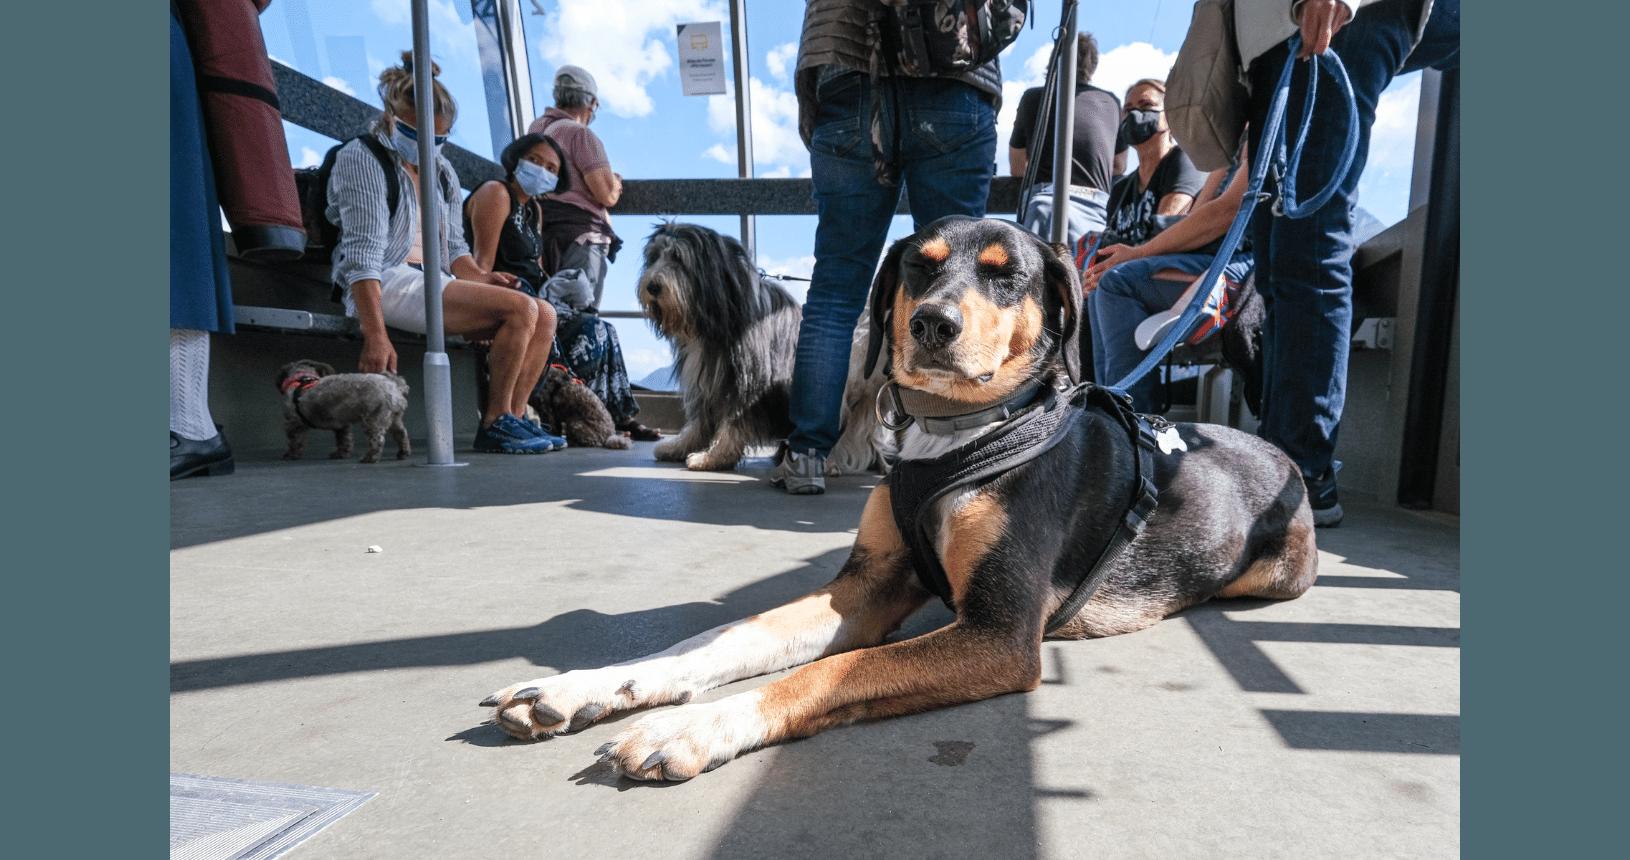 Hundereise Disentis Gondelfahrt mit dem Hund